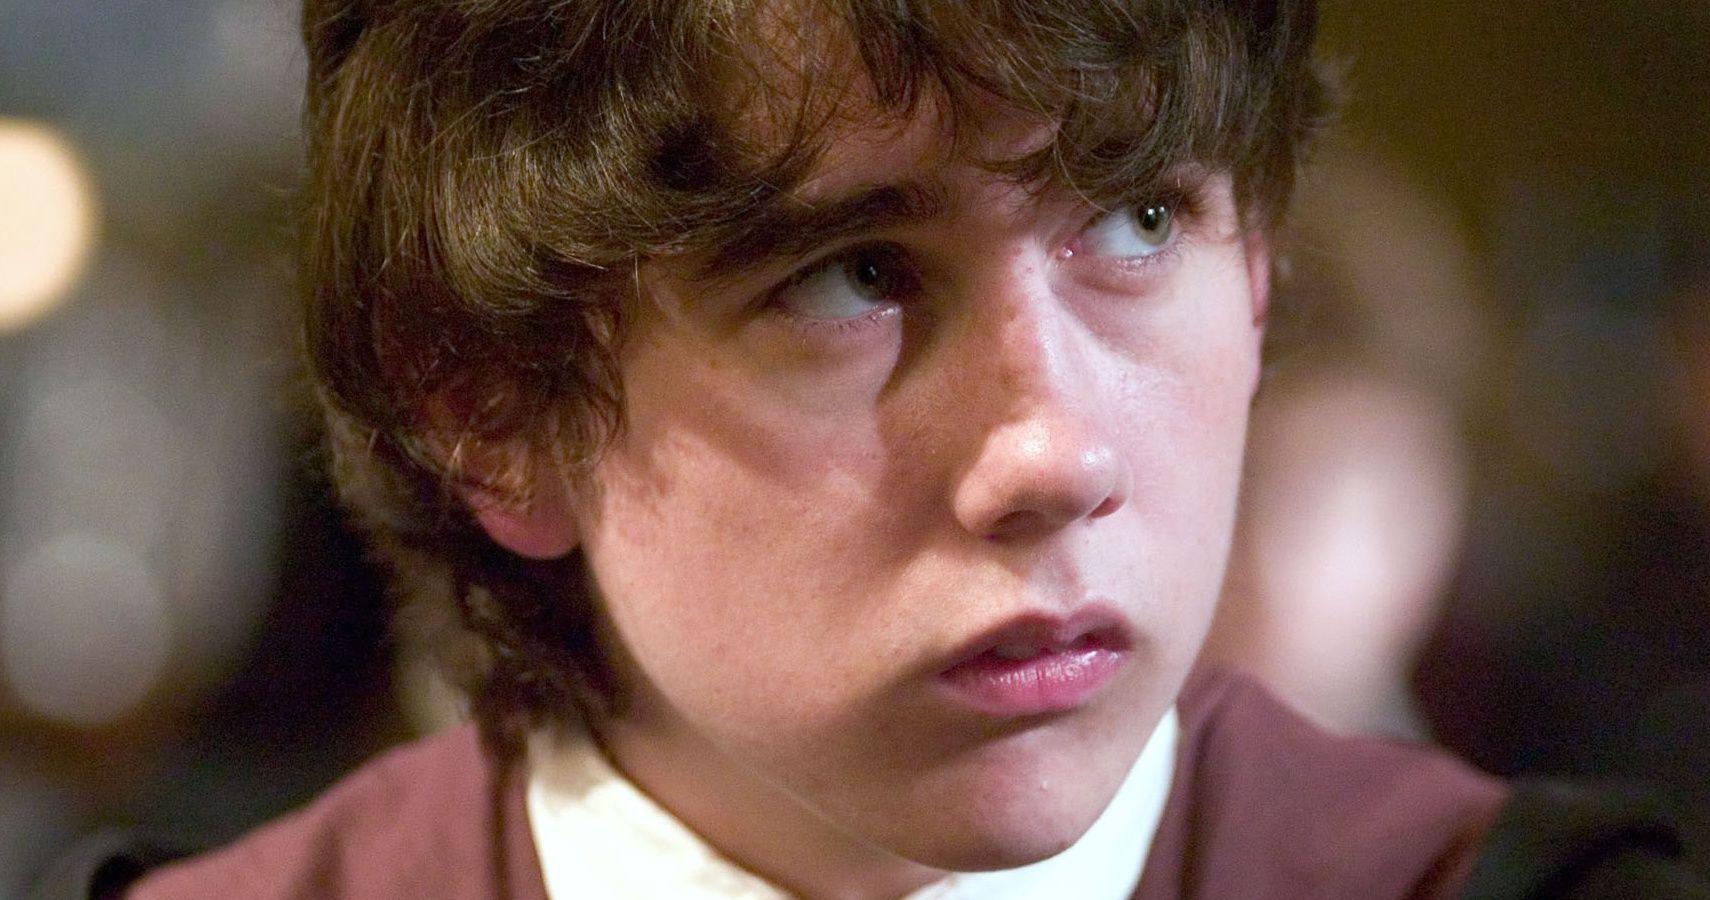 Harry Potter: Neville Longbottom's 5 Best Traits (& 5 Worst)